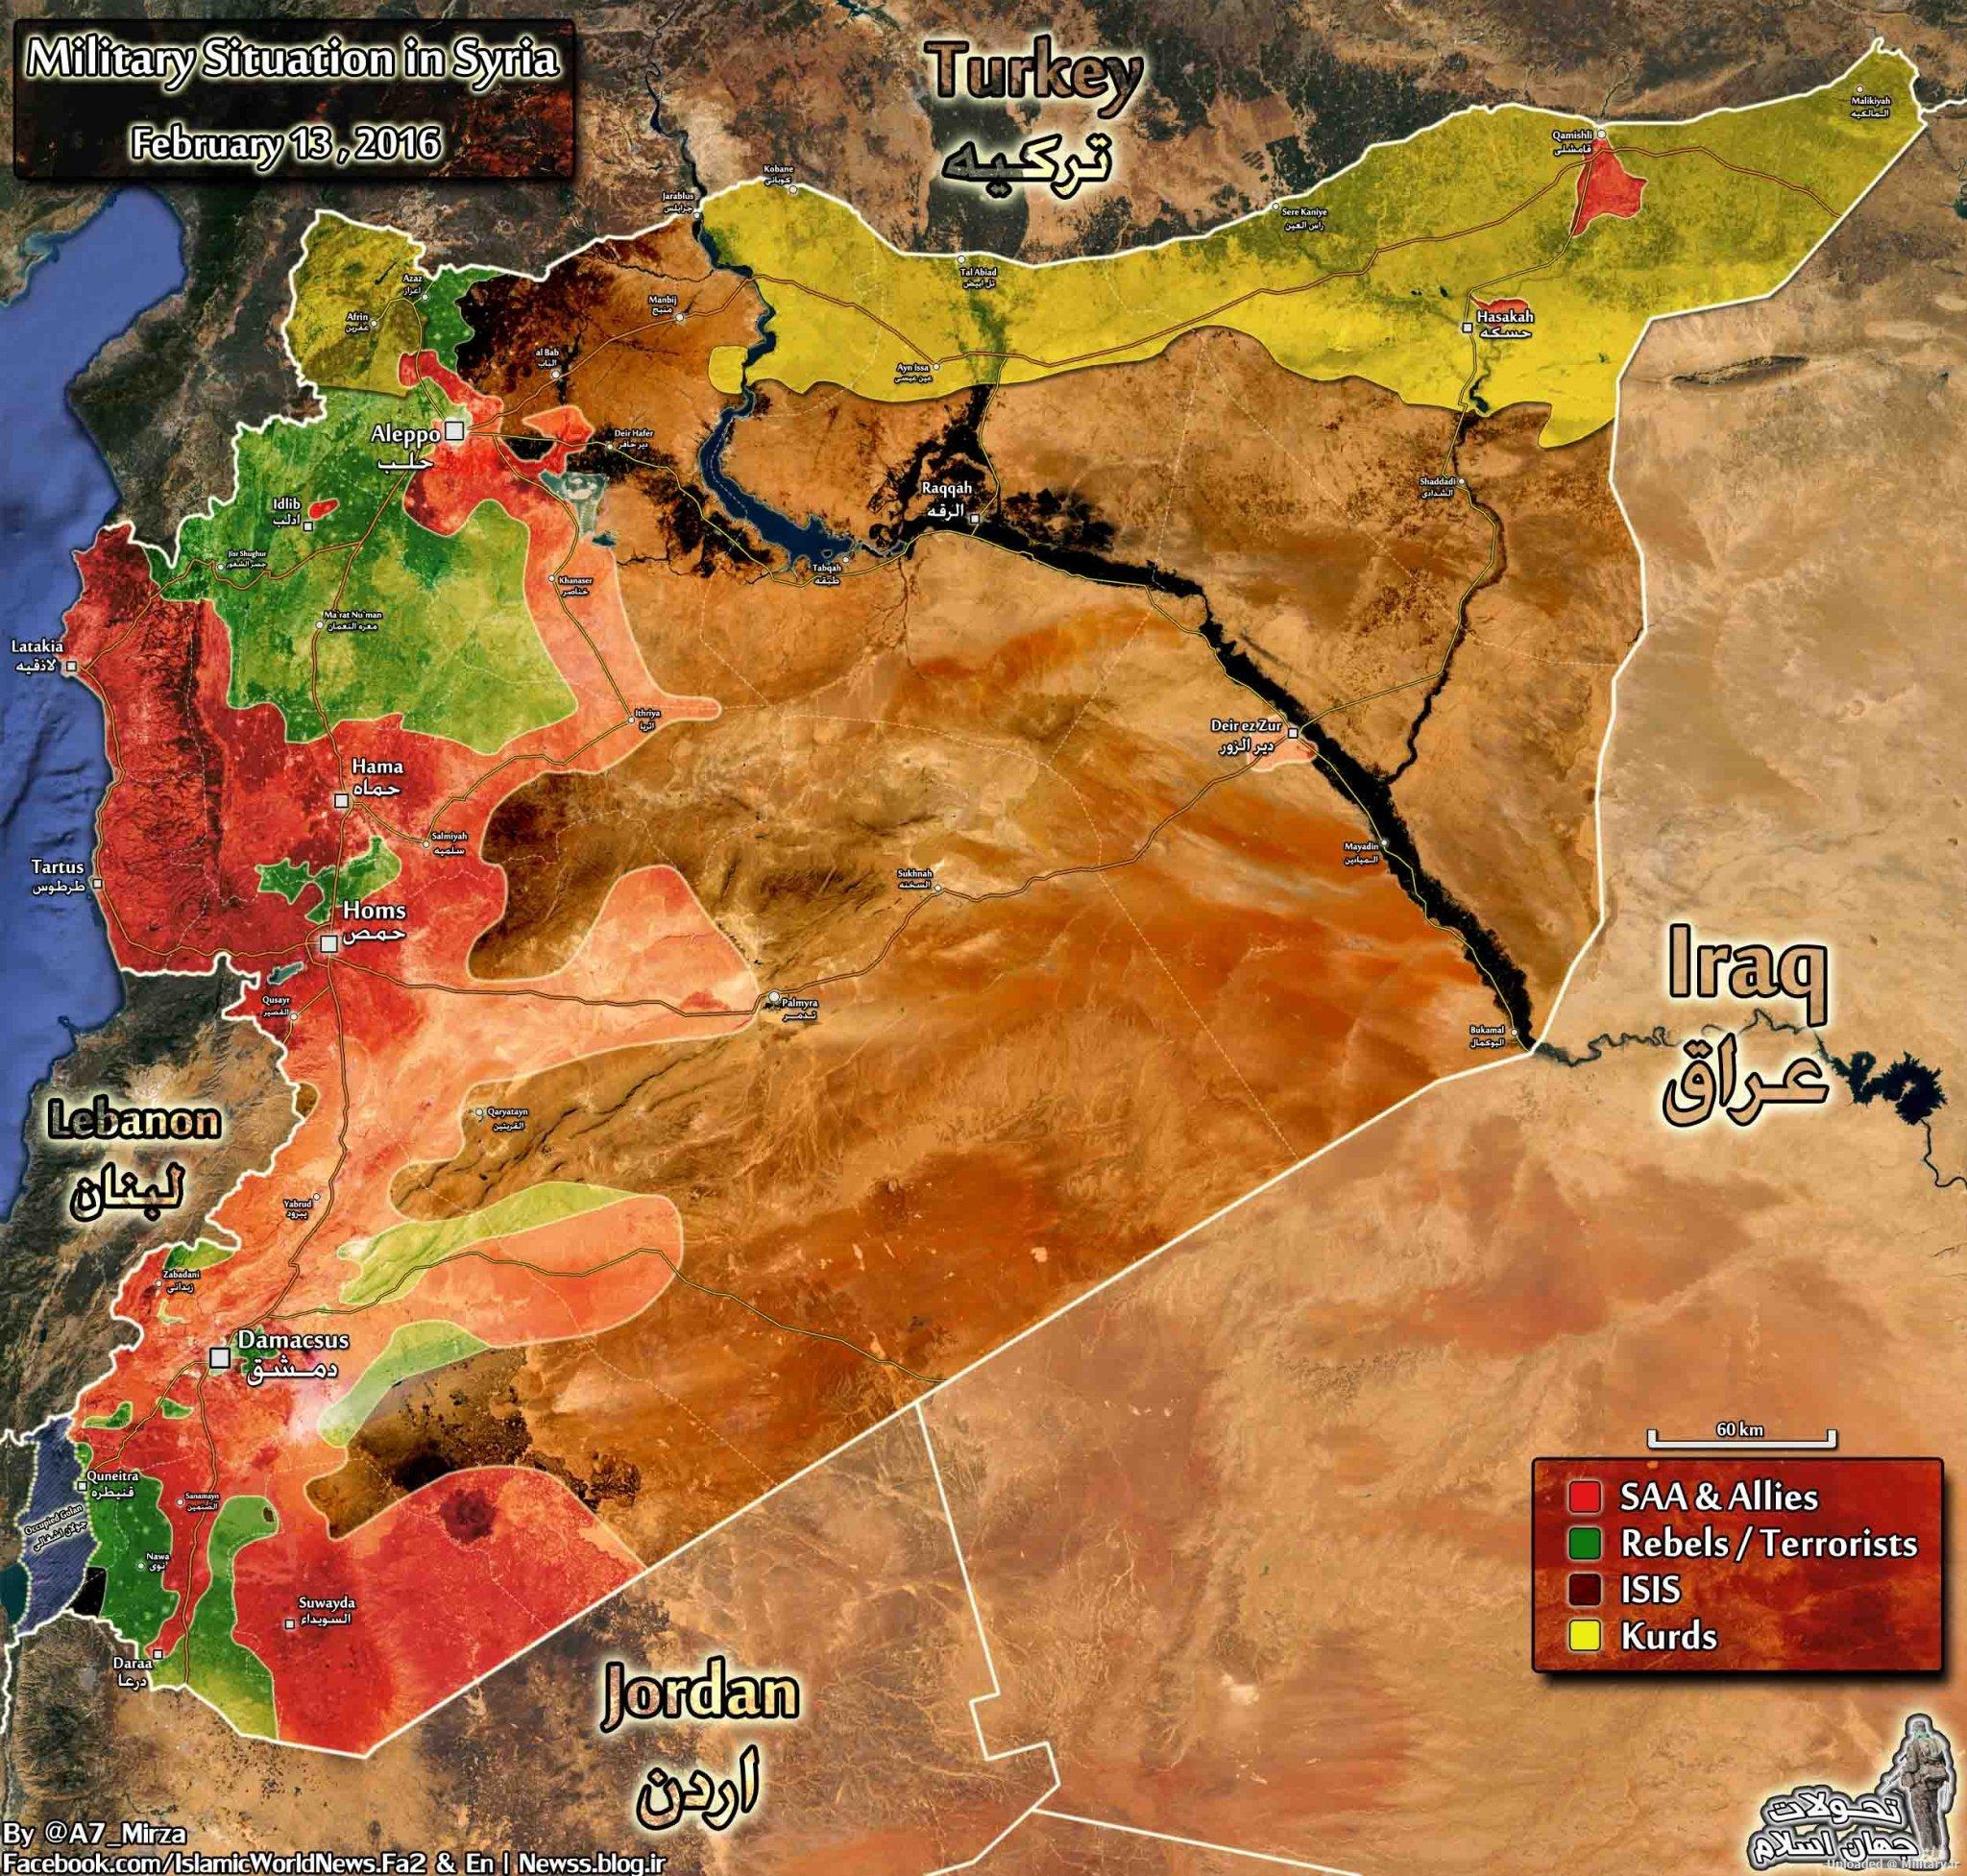 Syria_map_wide_13feb_24bahman_low.JPG